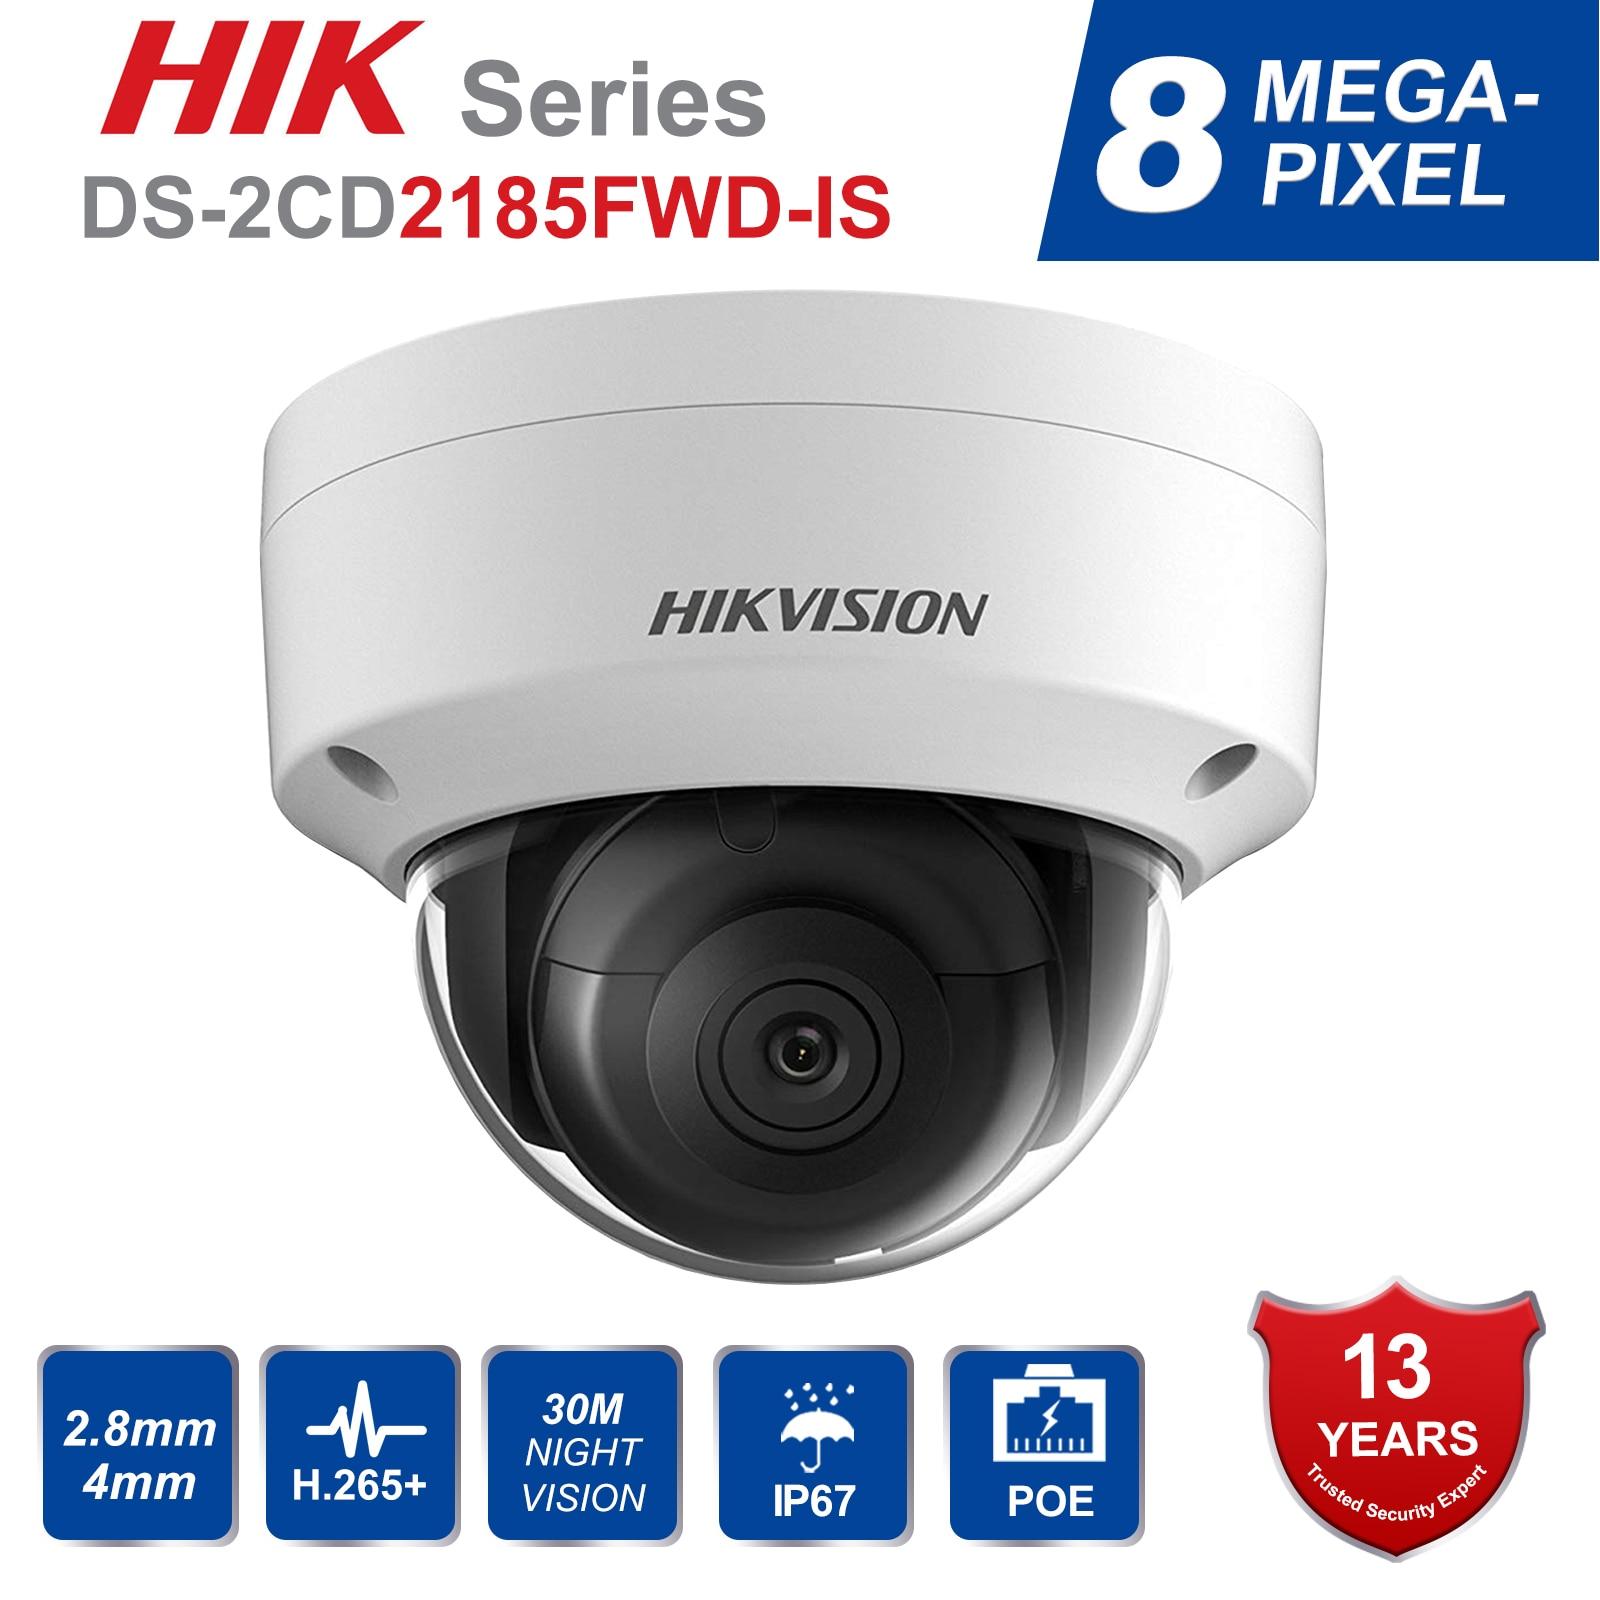 e01e9f8b2e3 Hik DS 2CD2185FWD IS 8MP Outdoor Dome ip Camera H.265 Updatable CCTV ...